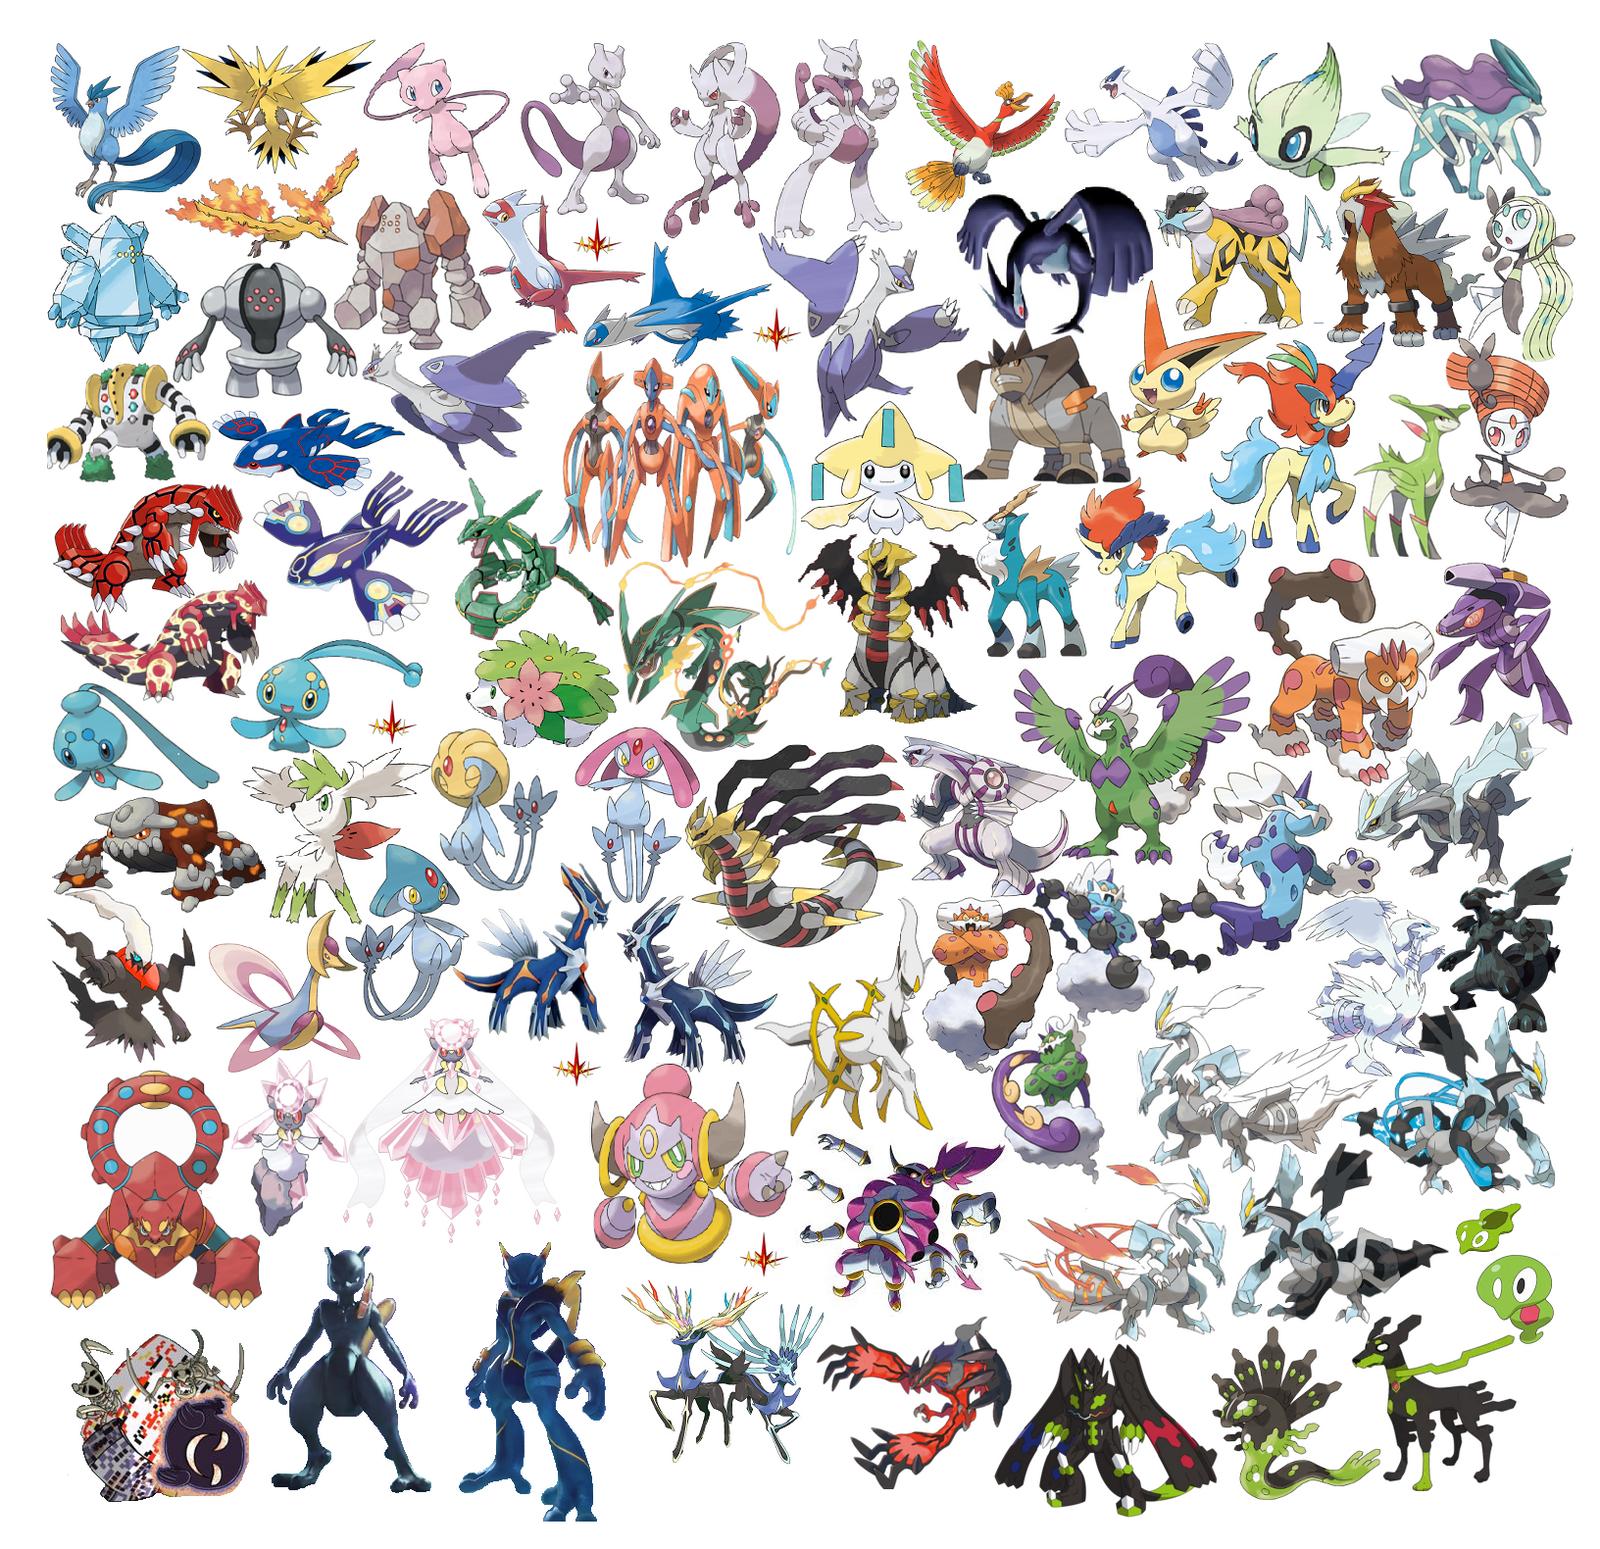 pokemones legendarios by N0variel on DeviantArt